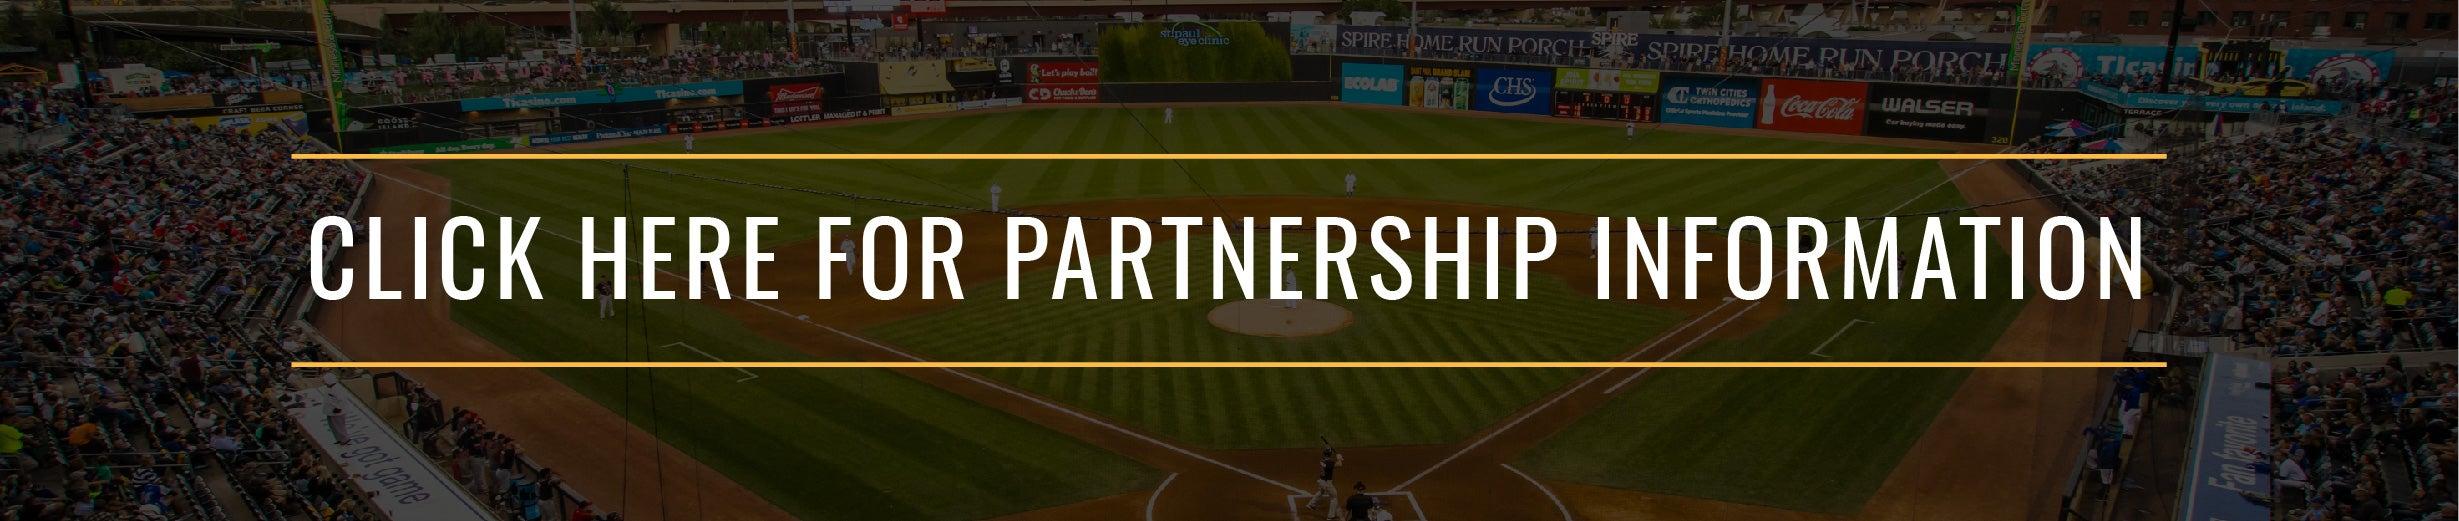 Partnership Information_1180x250-01.jpg